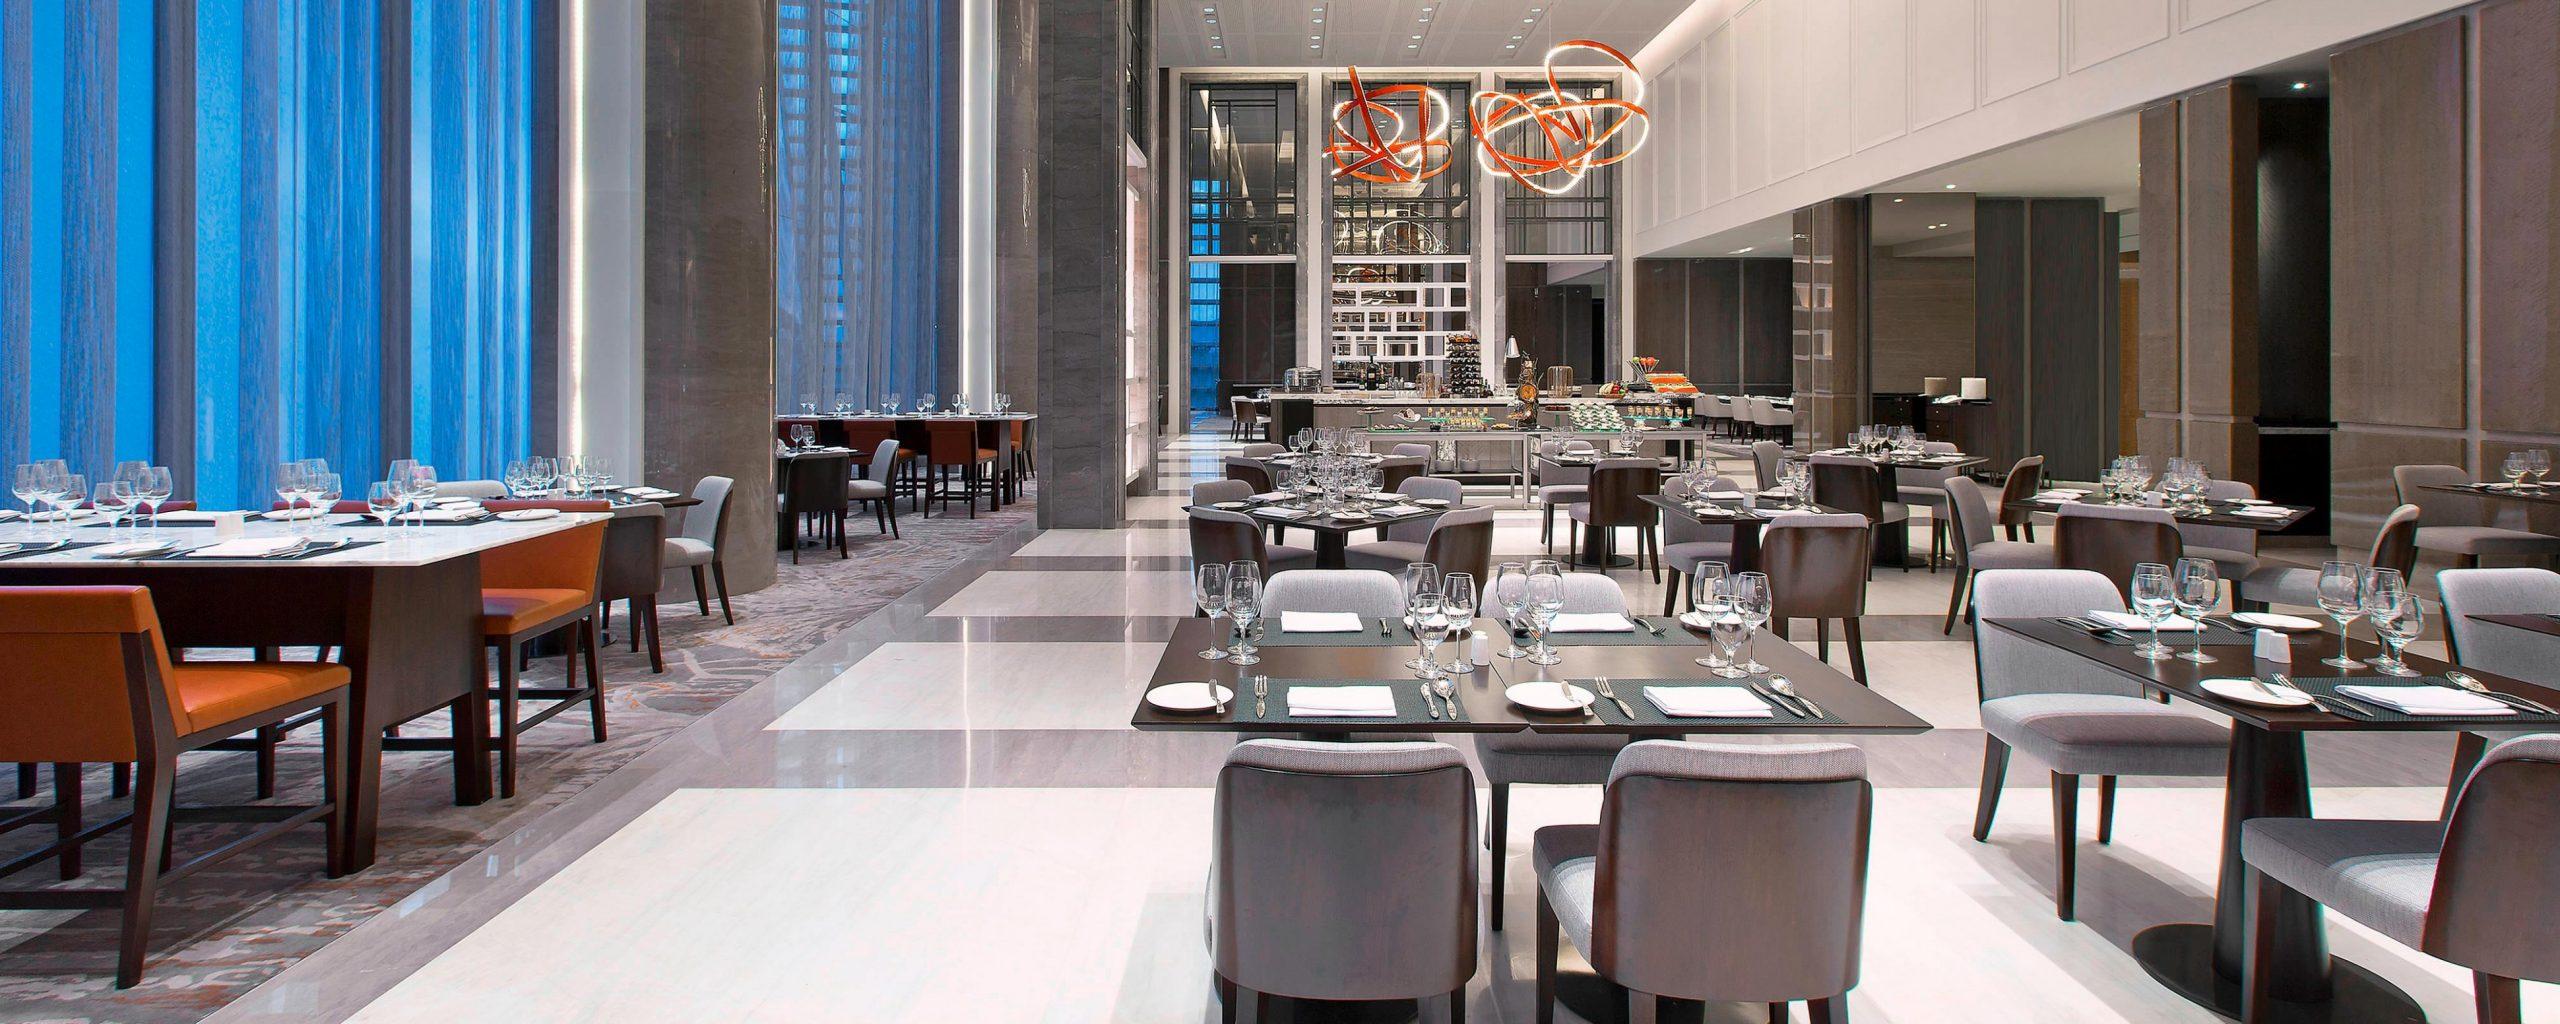 Indonesian Hotel Restaurant  Sheraton Grand Jakarta Gandaria City  - Baby Room Gandaria City